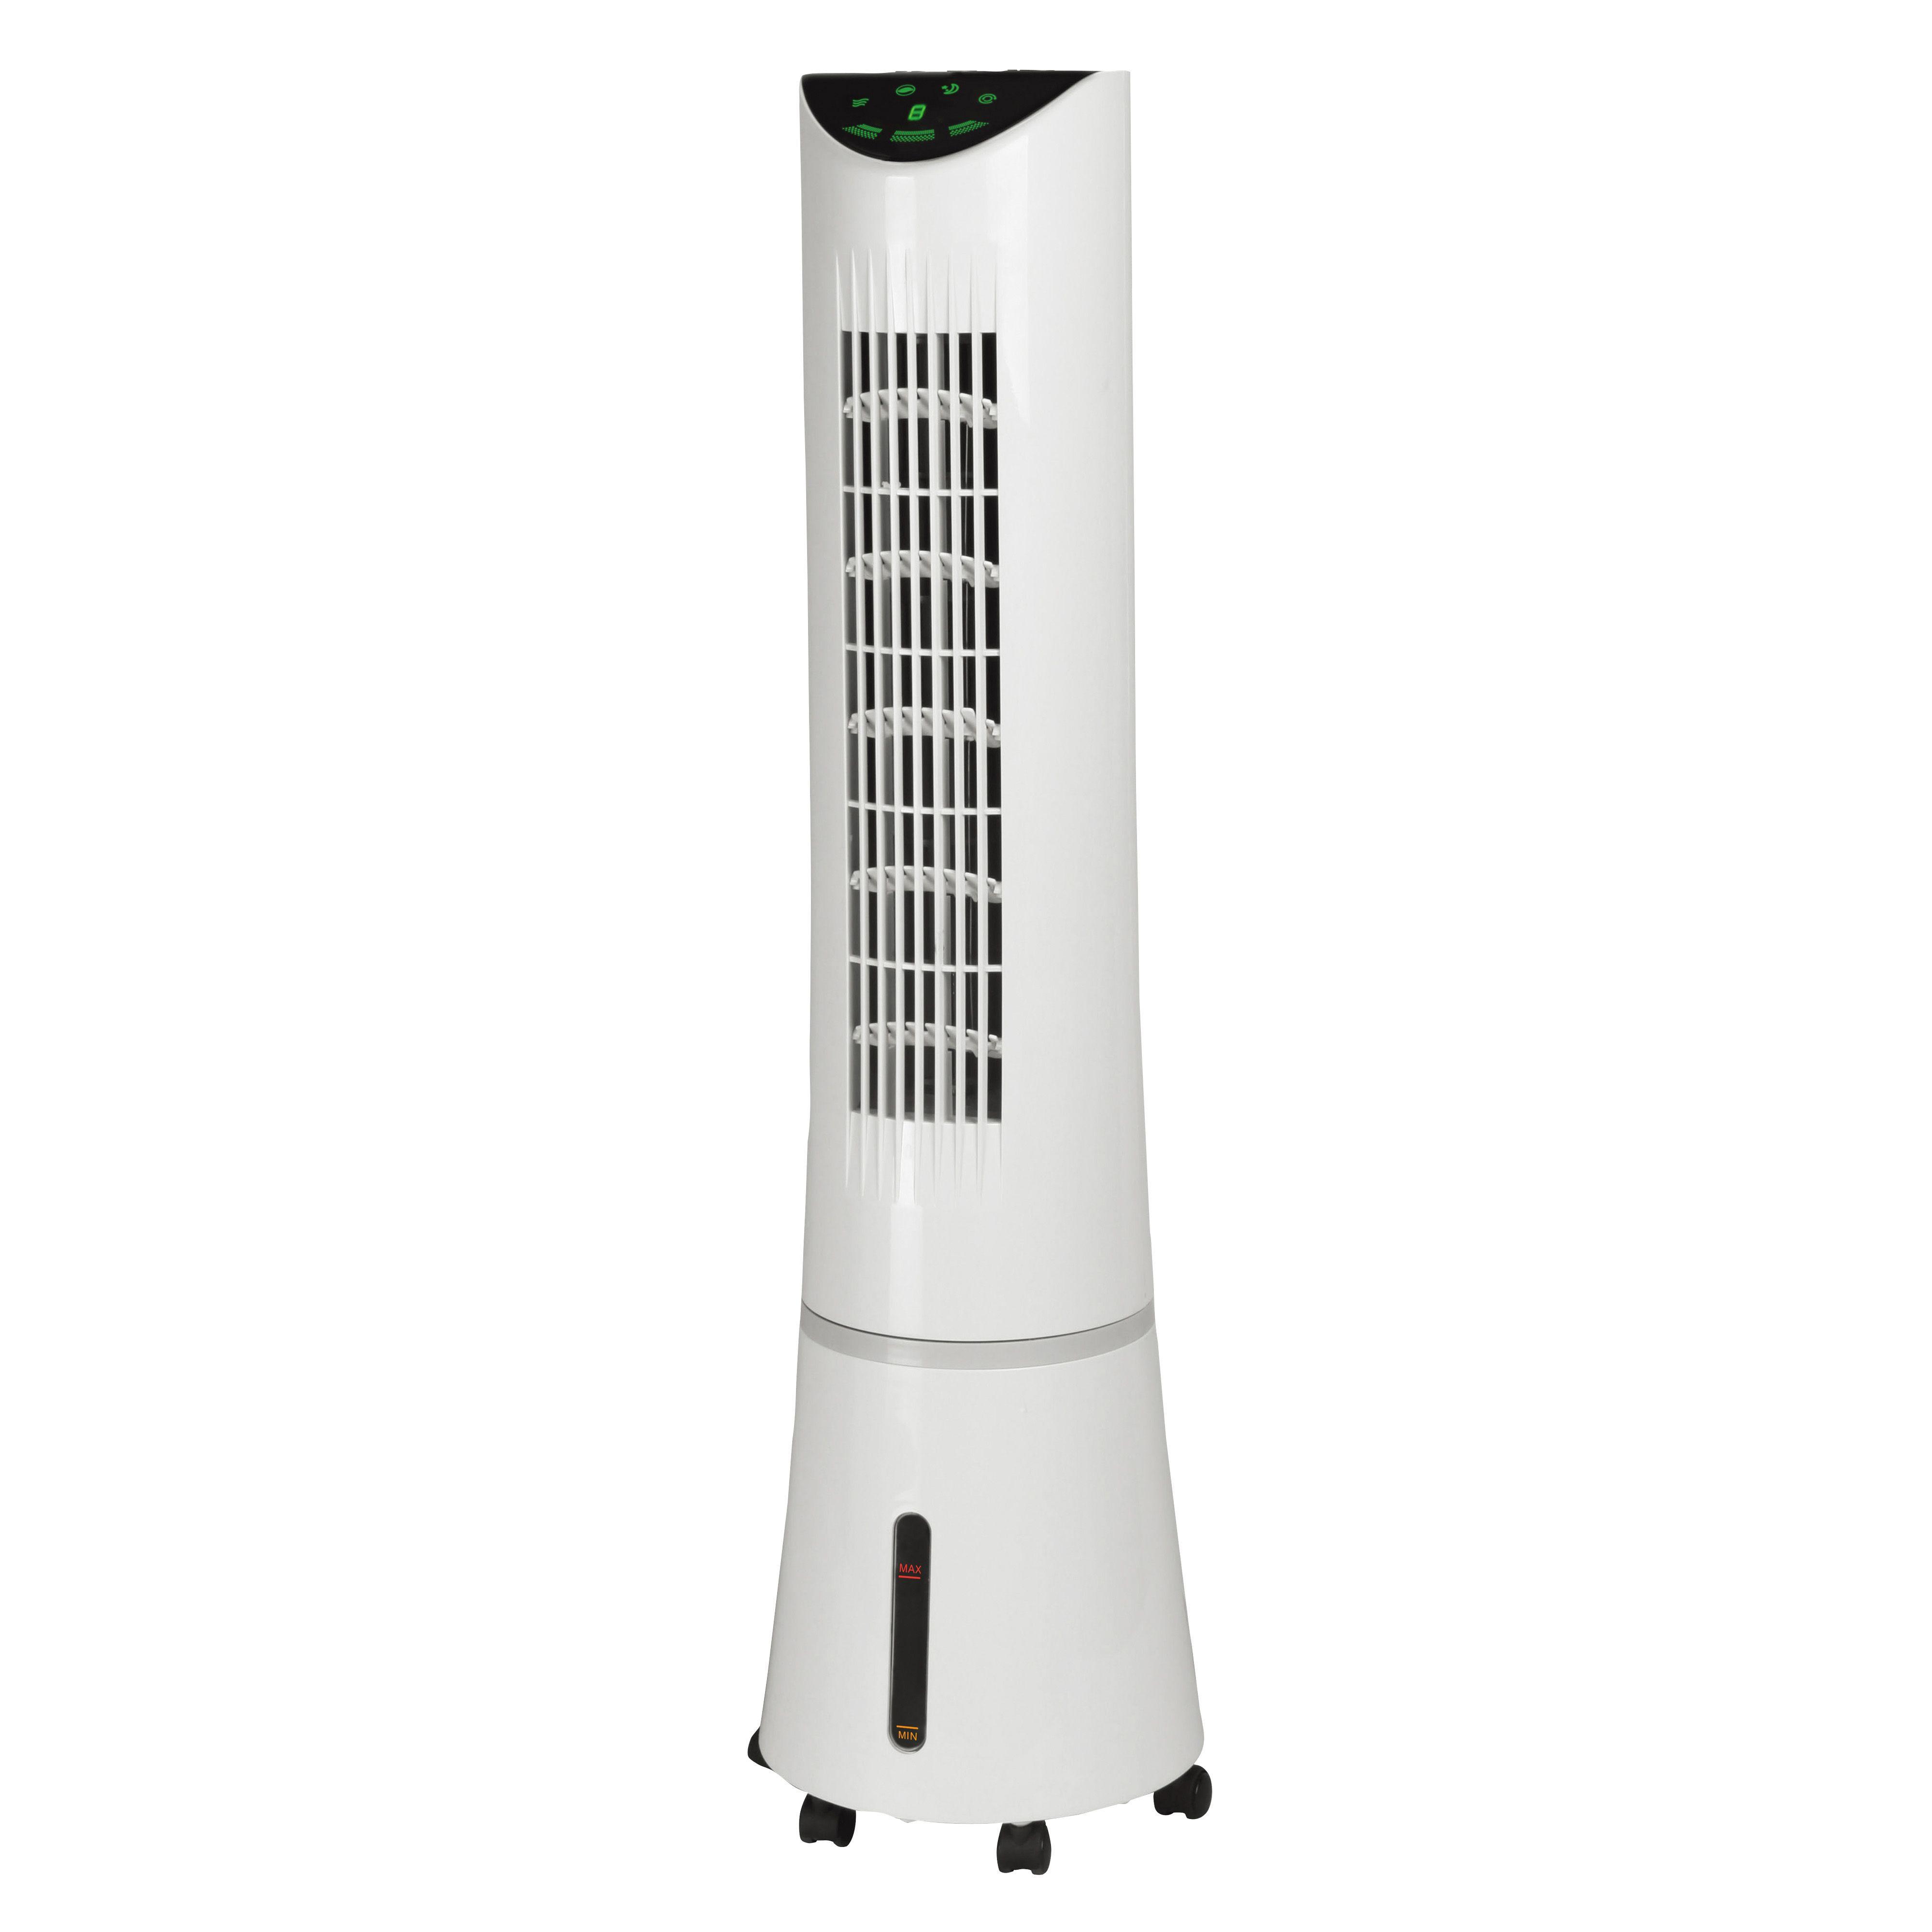 Blyss Air Cooler Departments Diy At B Amp Q